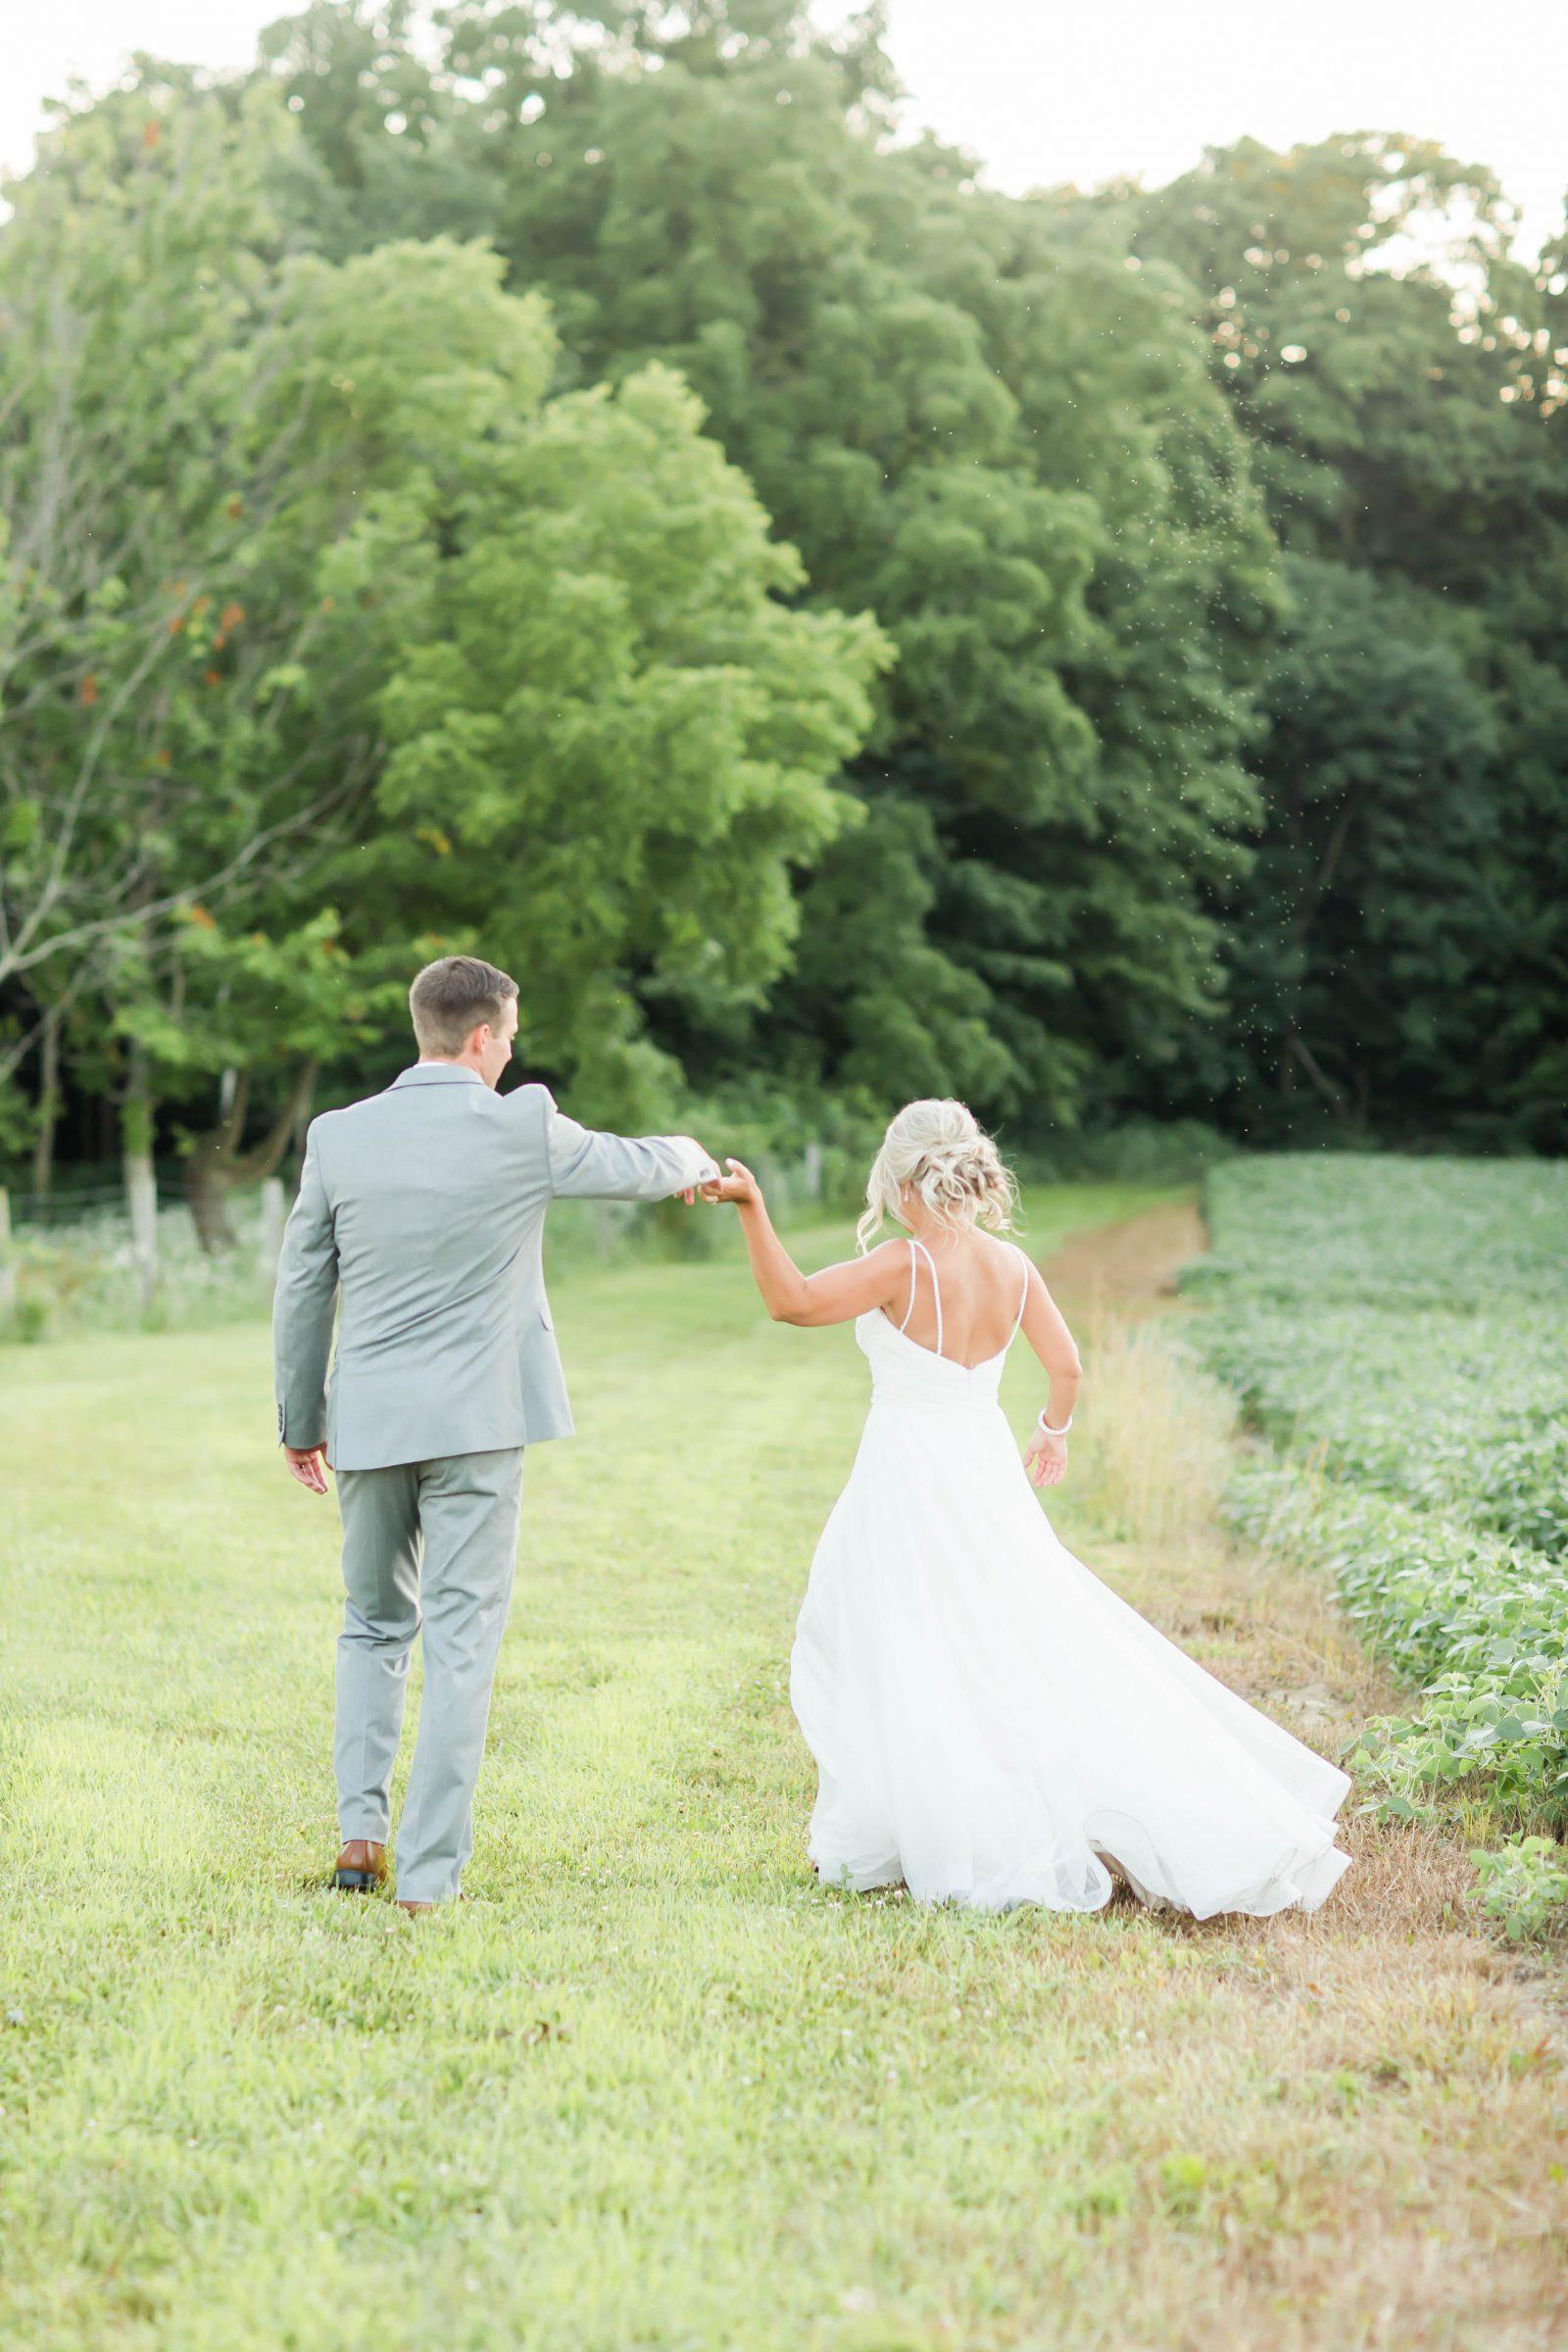 peacock-ridge-summer-wedding-photographer-akron-ohio-loren-jackson-photography-124